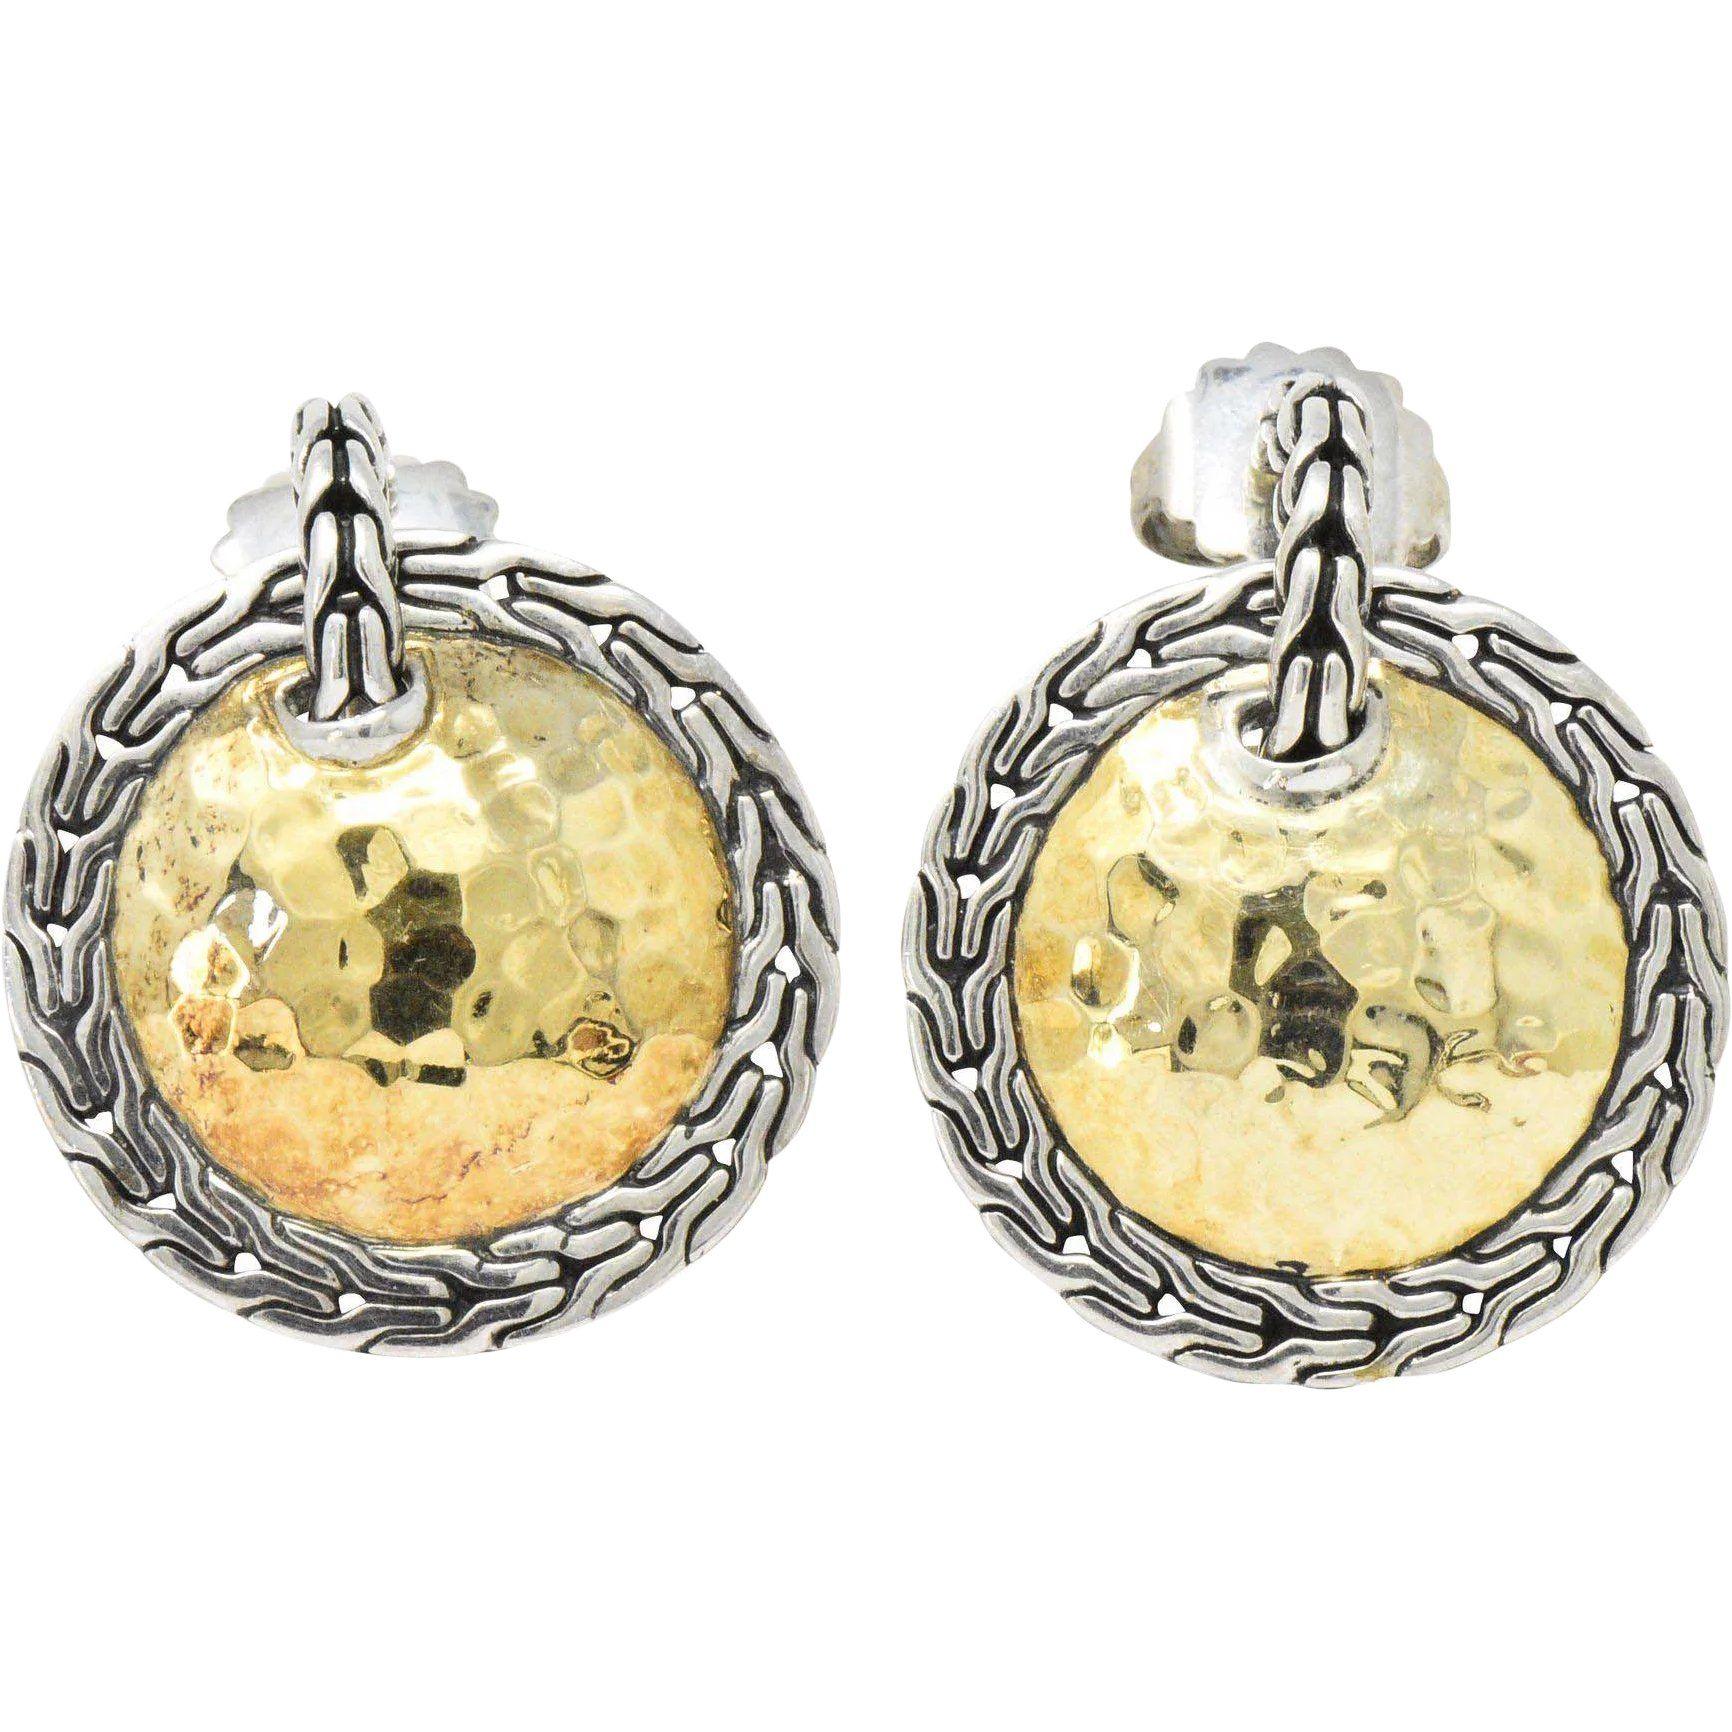 f45b2dfe5 John Hardy 22 Karat Gold Sterling Silver Classic Chain and Disc Earrings